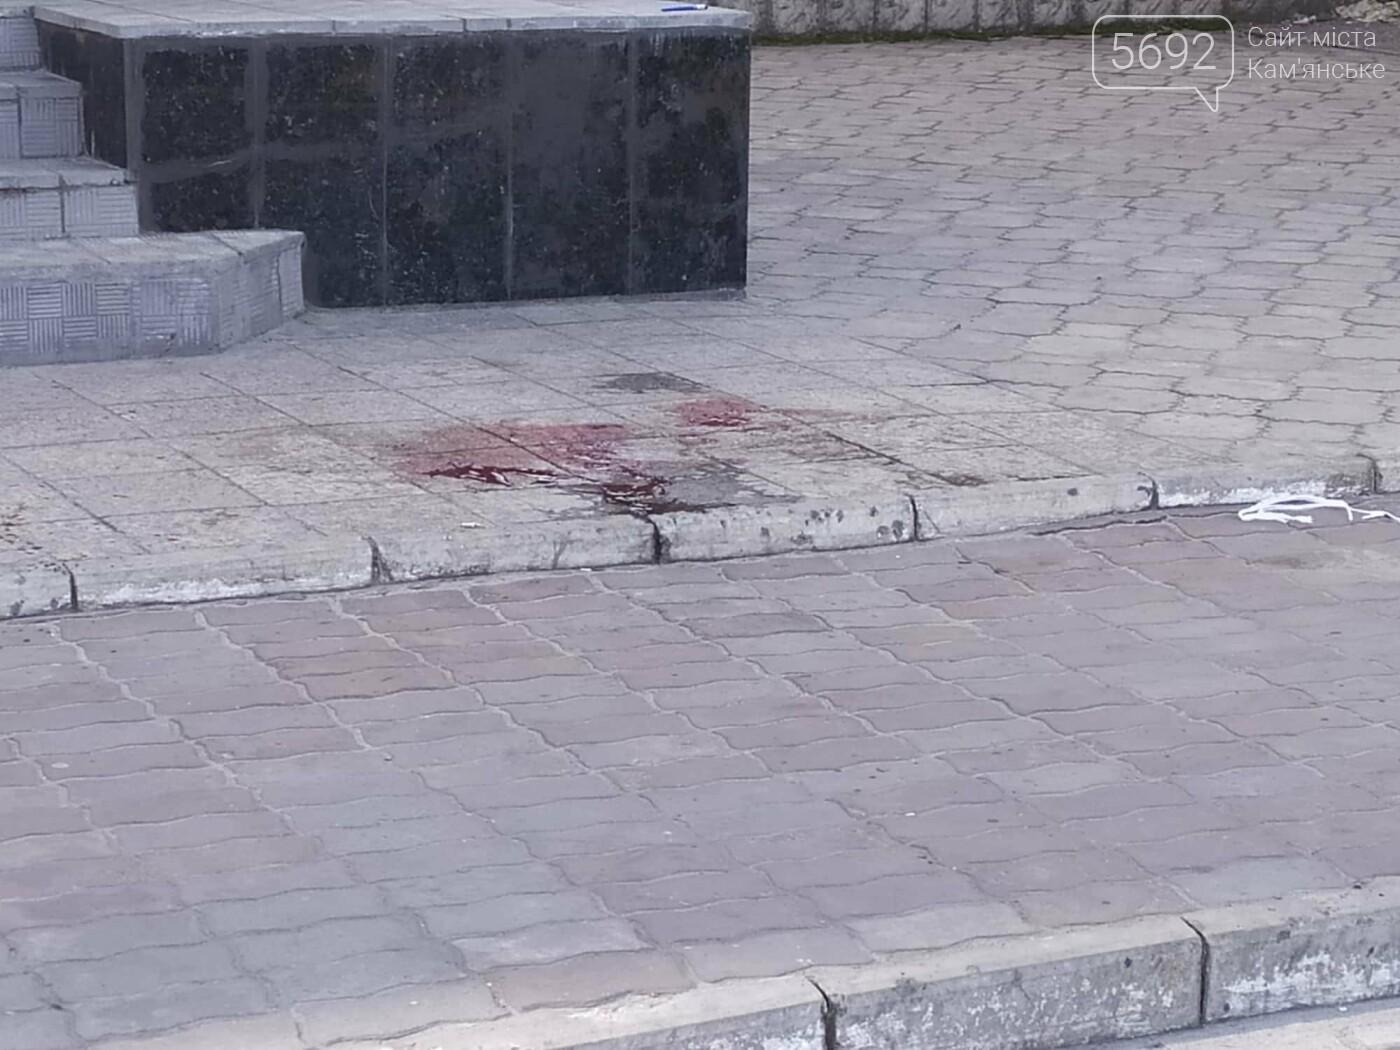 В  центре Каменского подстрелили активиста Евгения Найду, фото-4